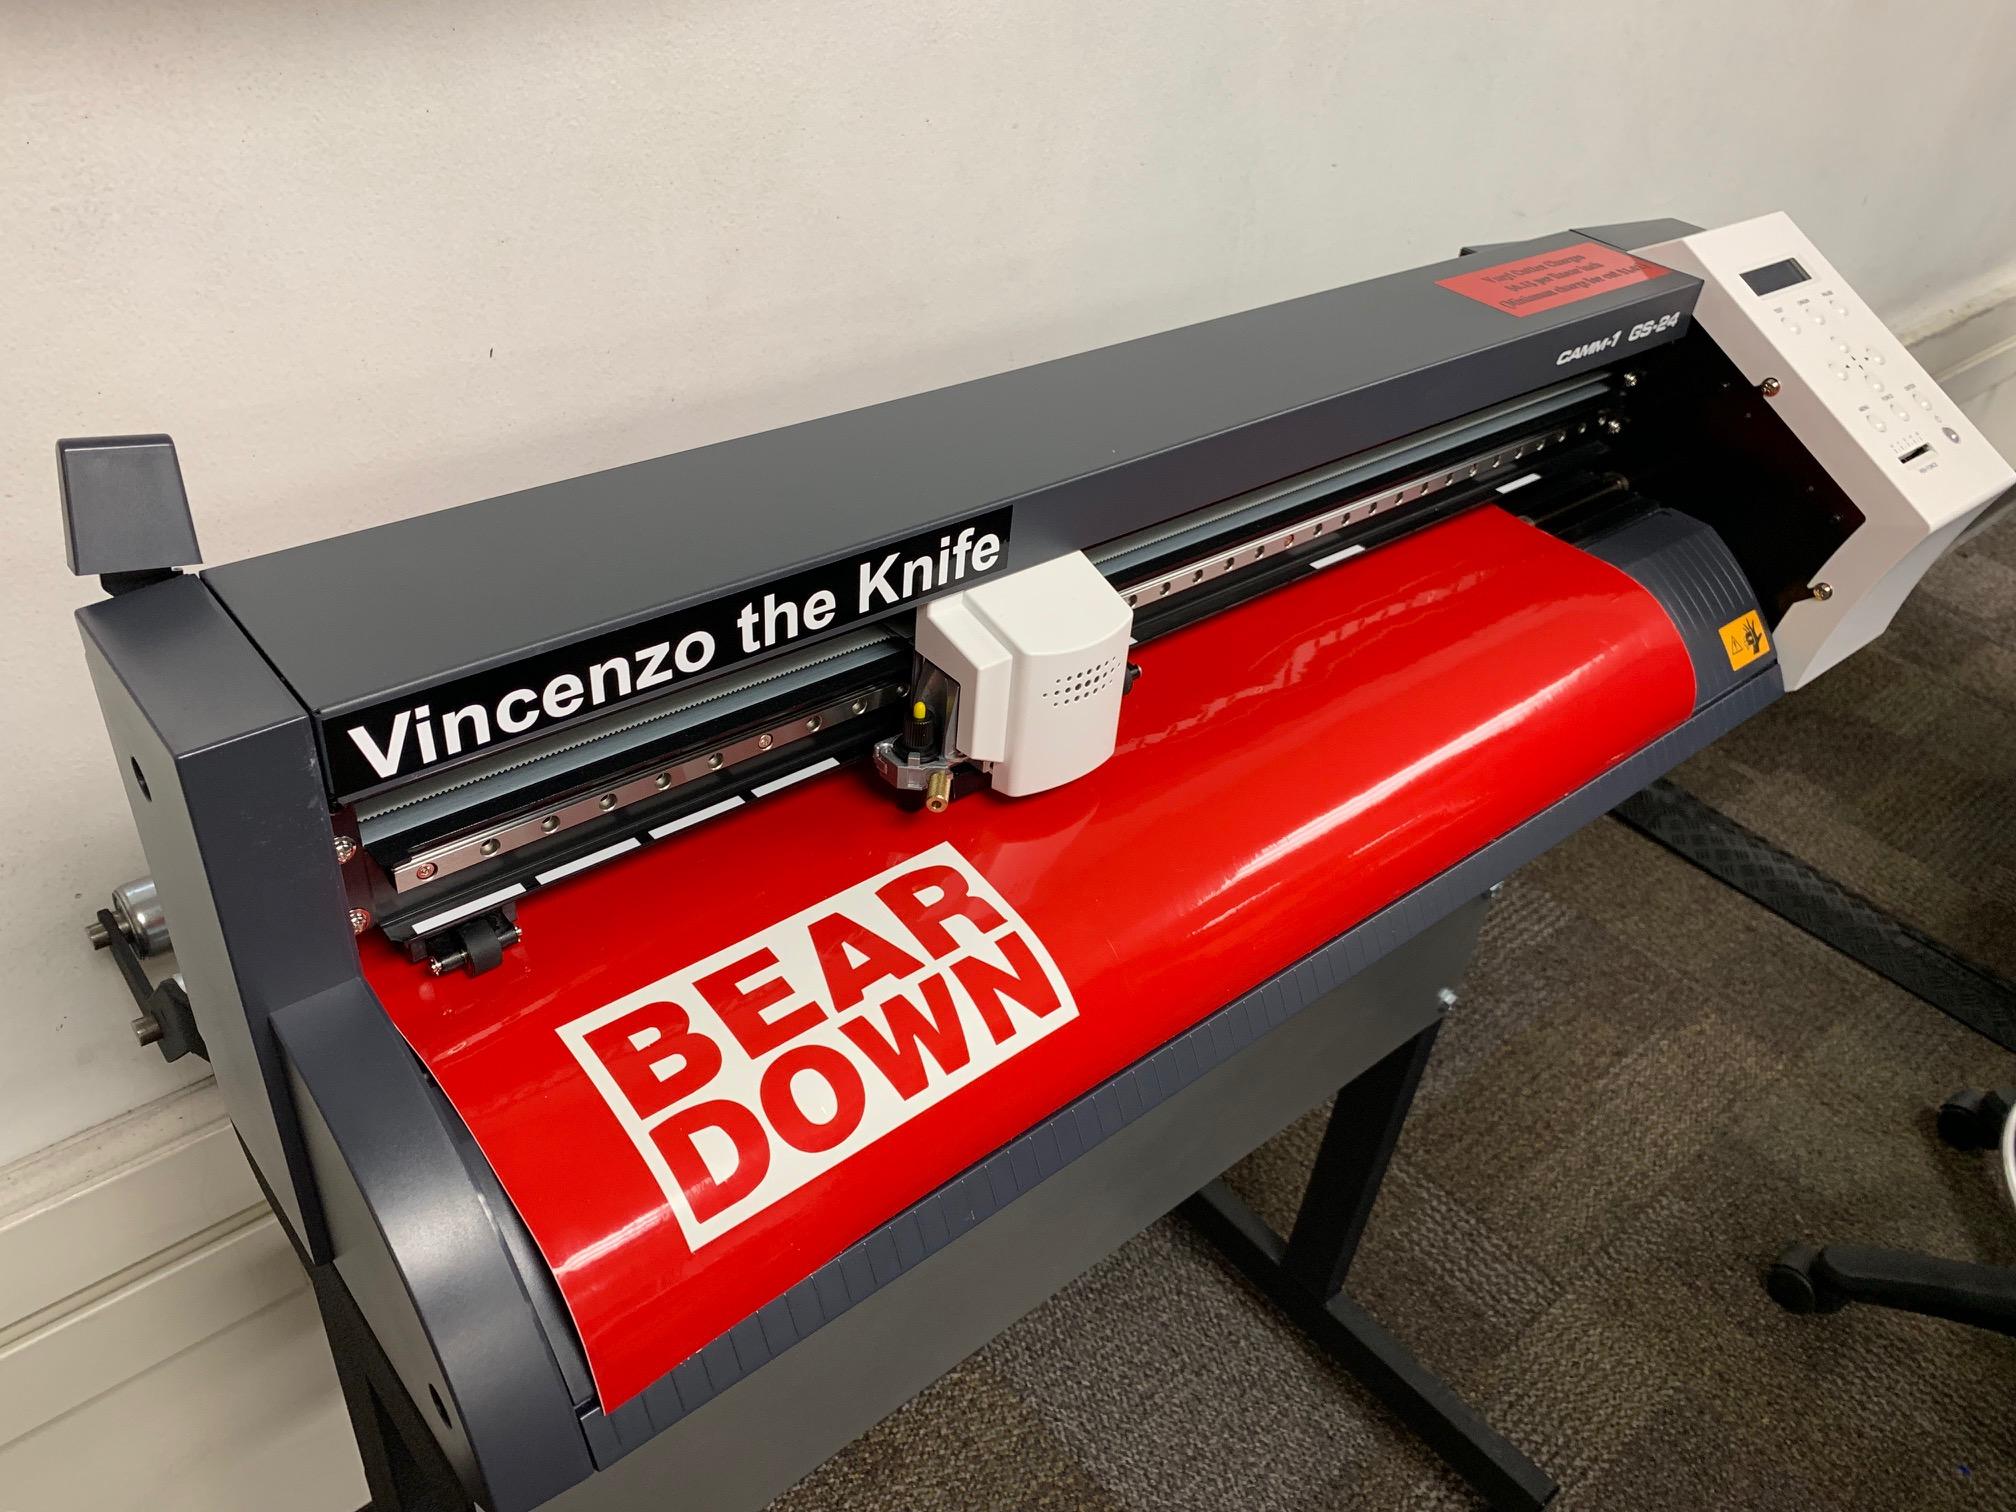 Vinyl Cutter Basics & Certification